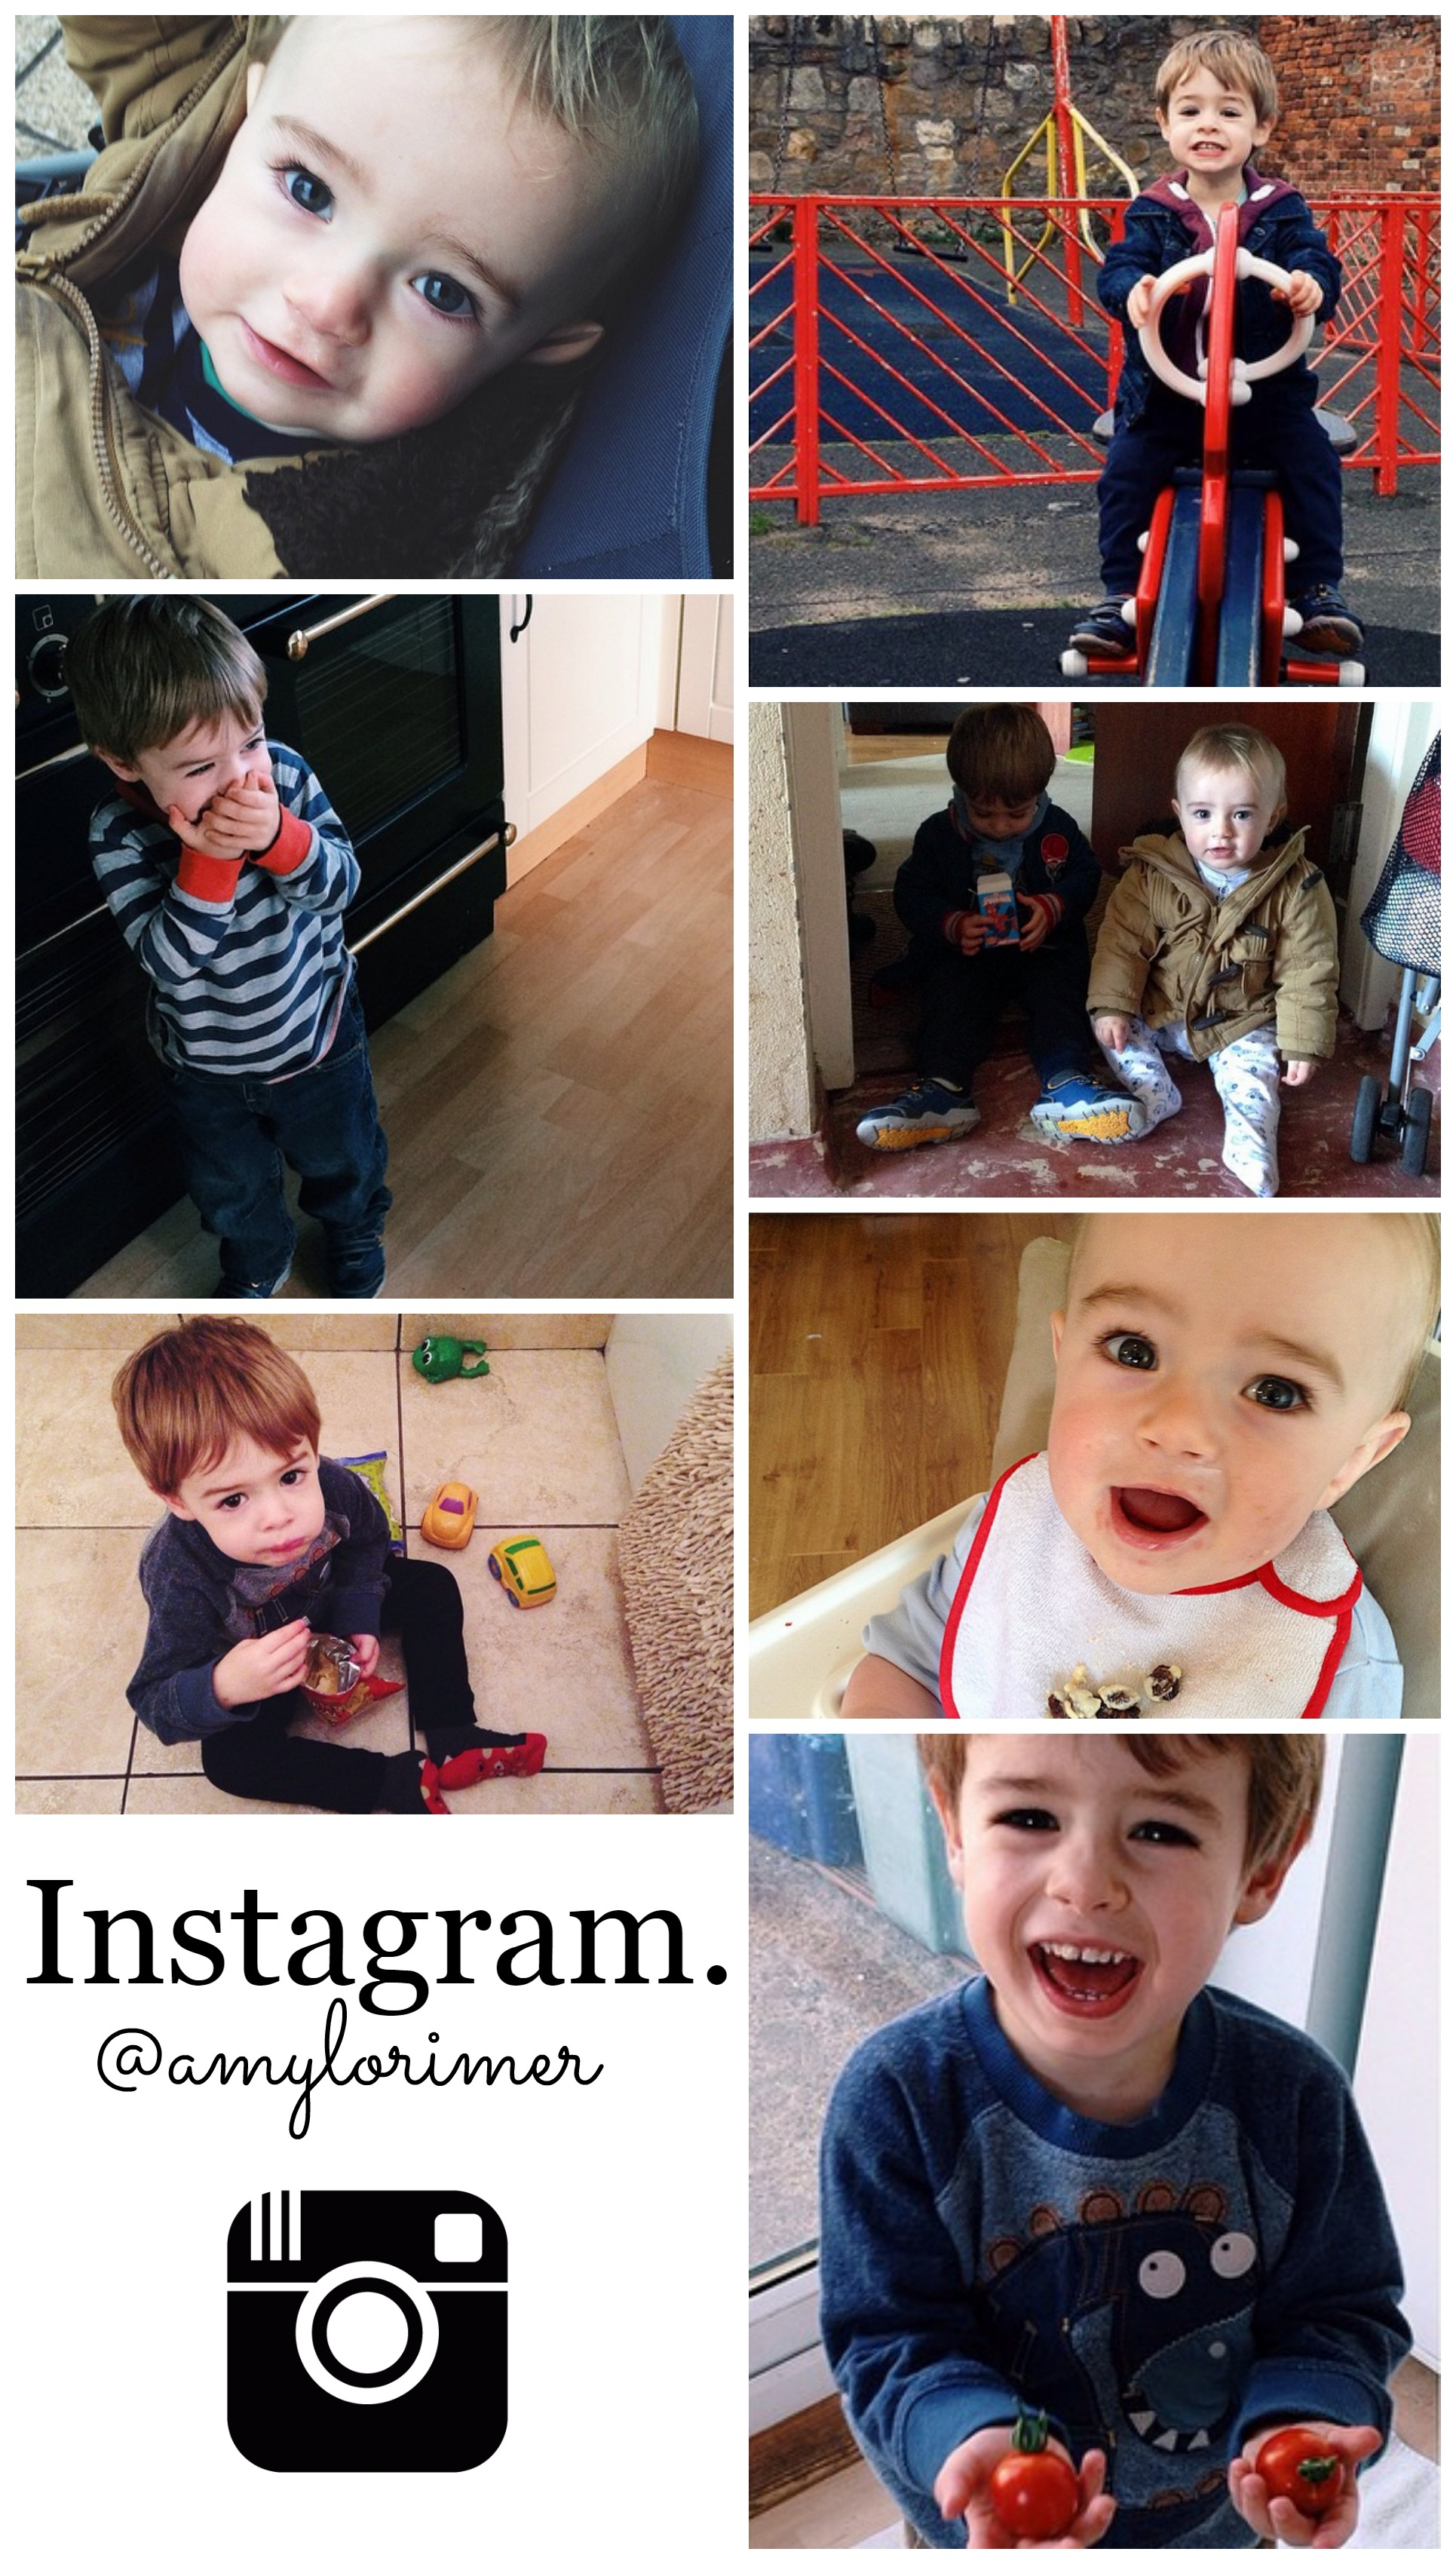 Instagram - @amylorimer